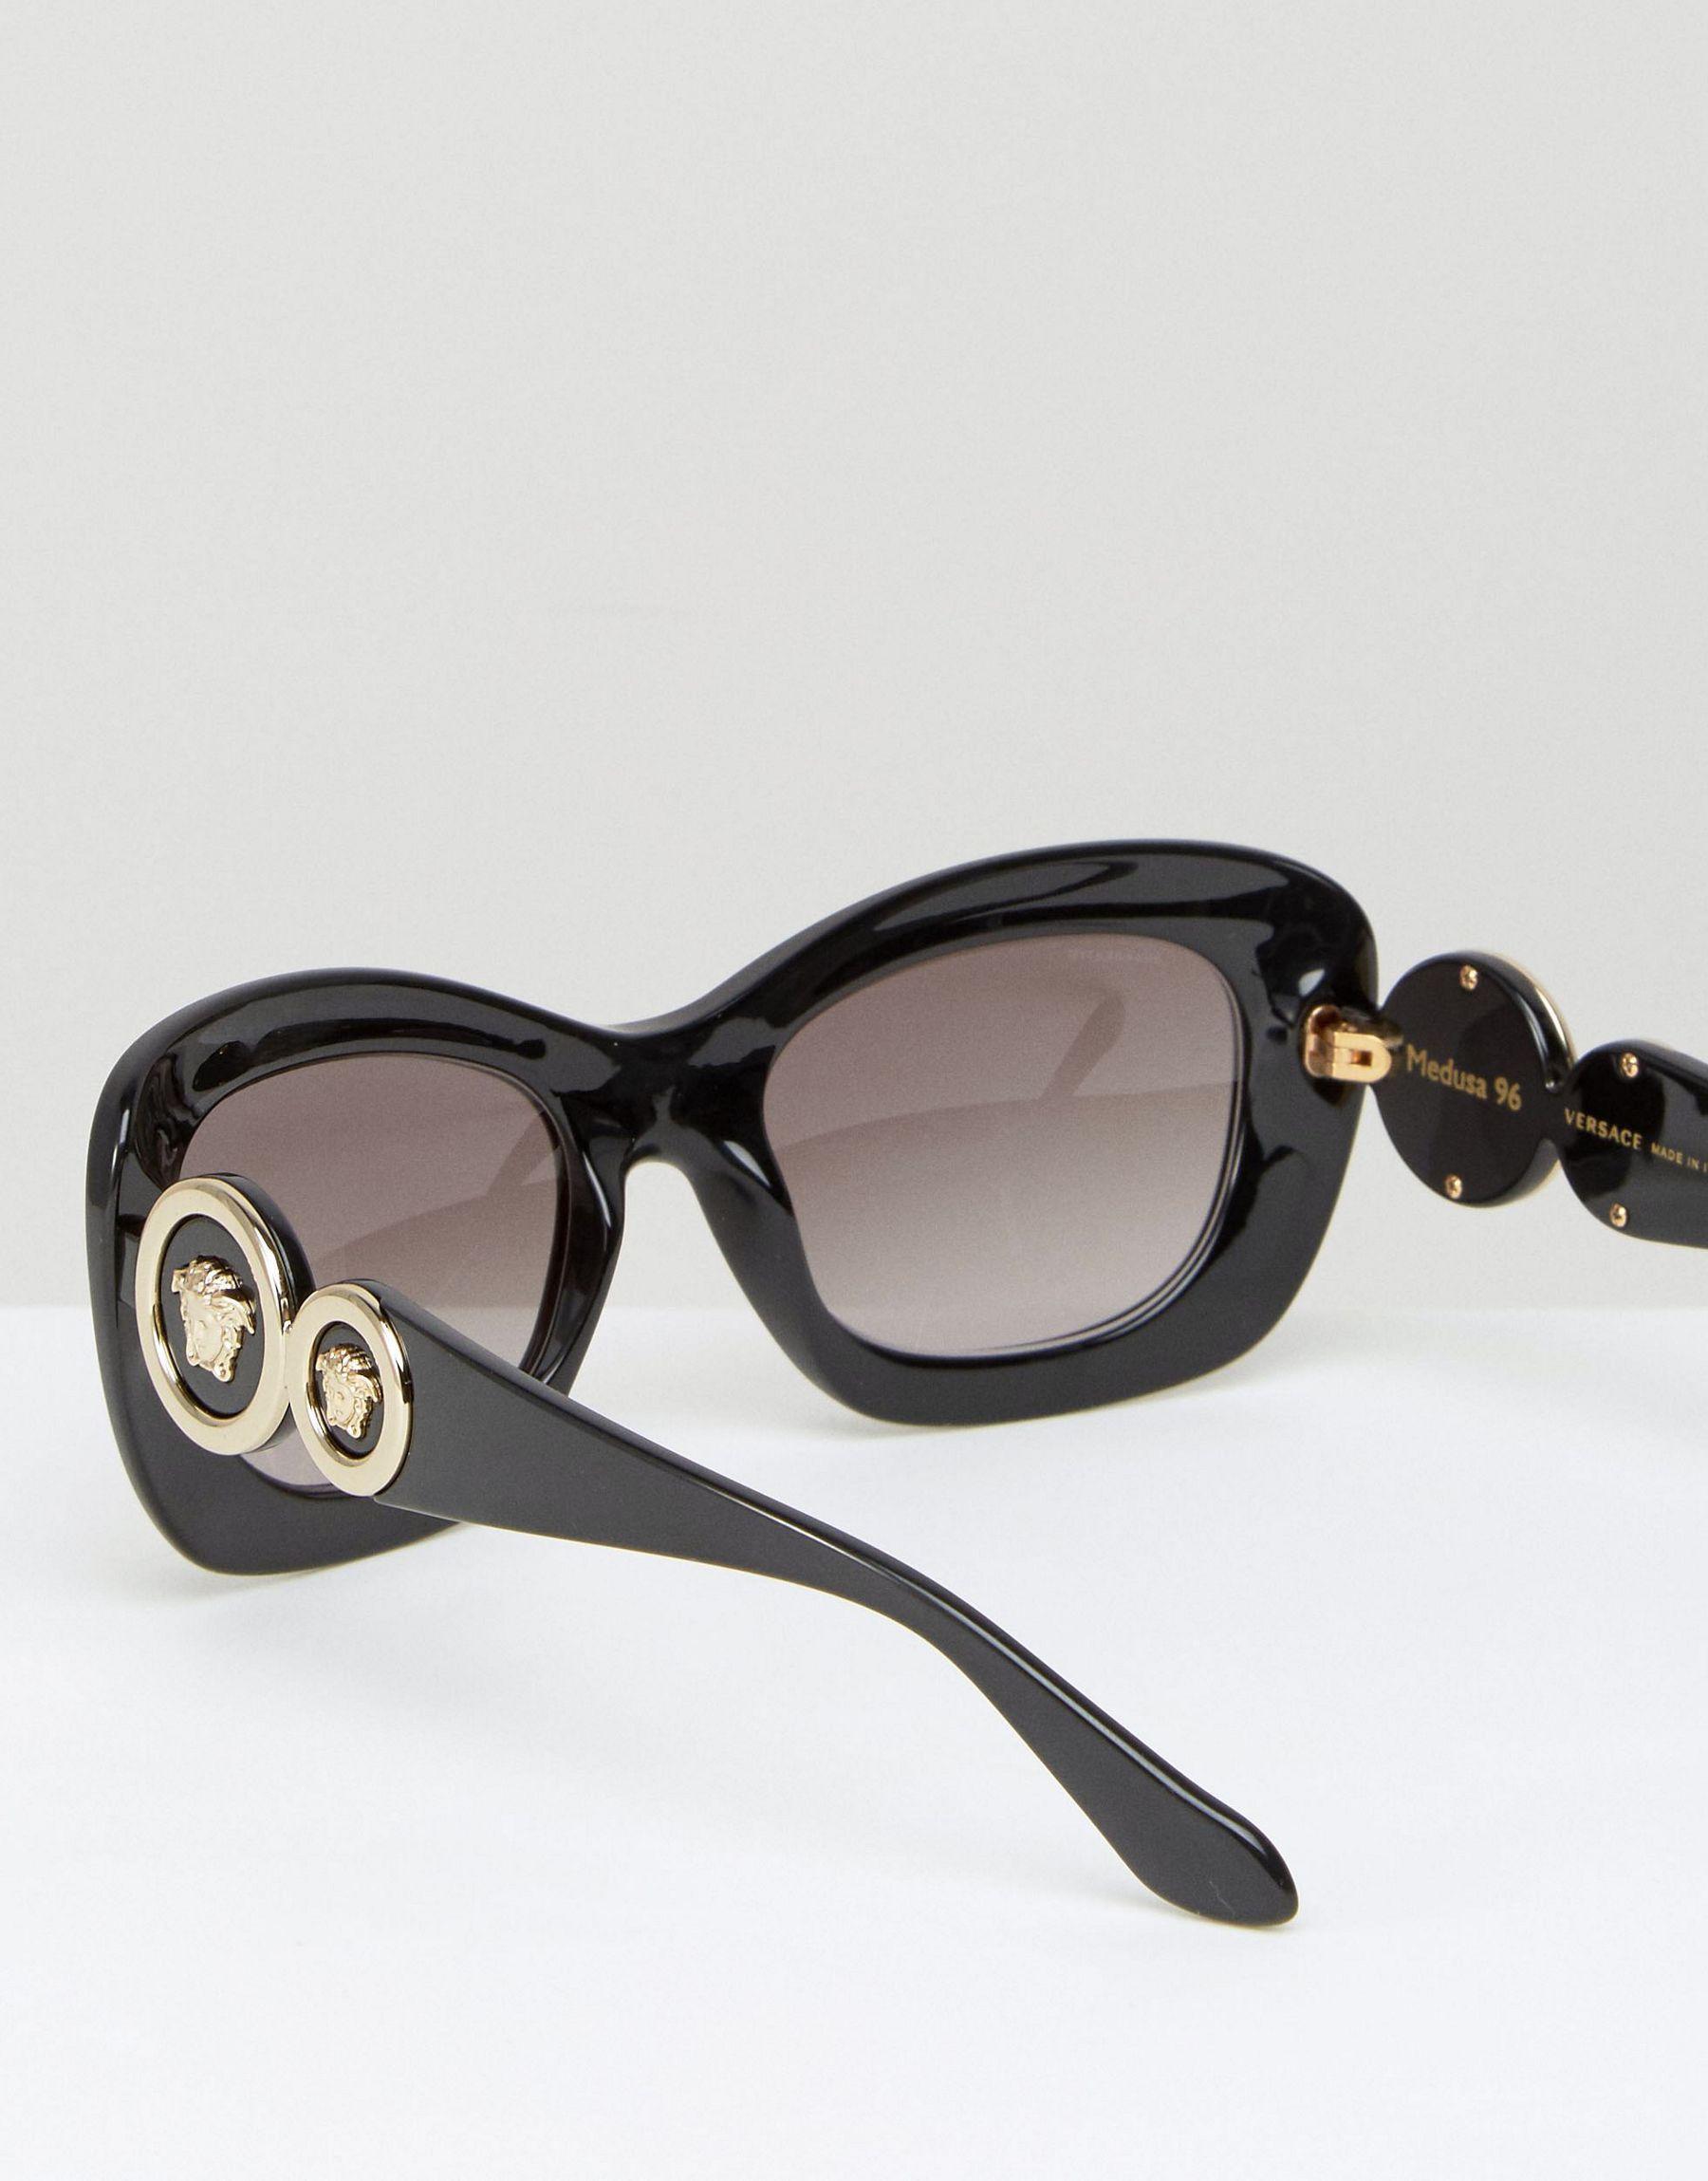 7ece5e3a3fe42 Lyst - Versace Cat Eye Sunglasses With Medusa Head Side Detail in Black